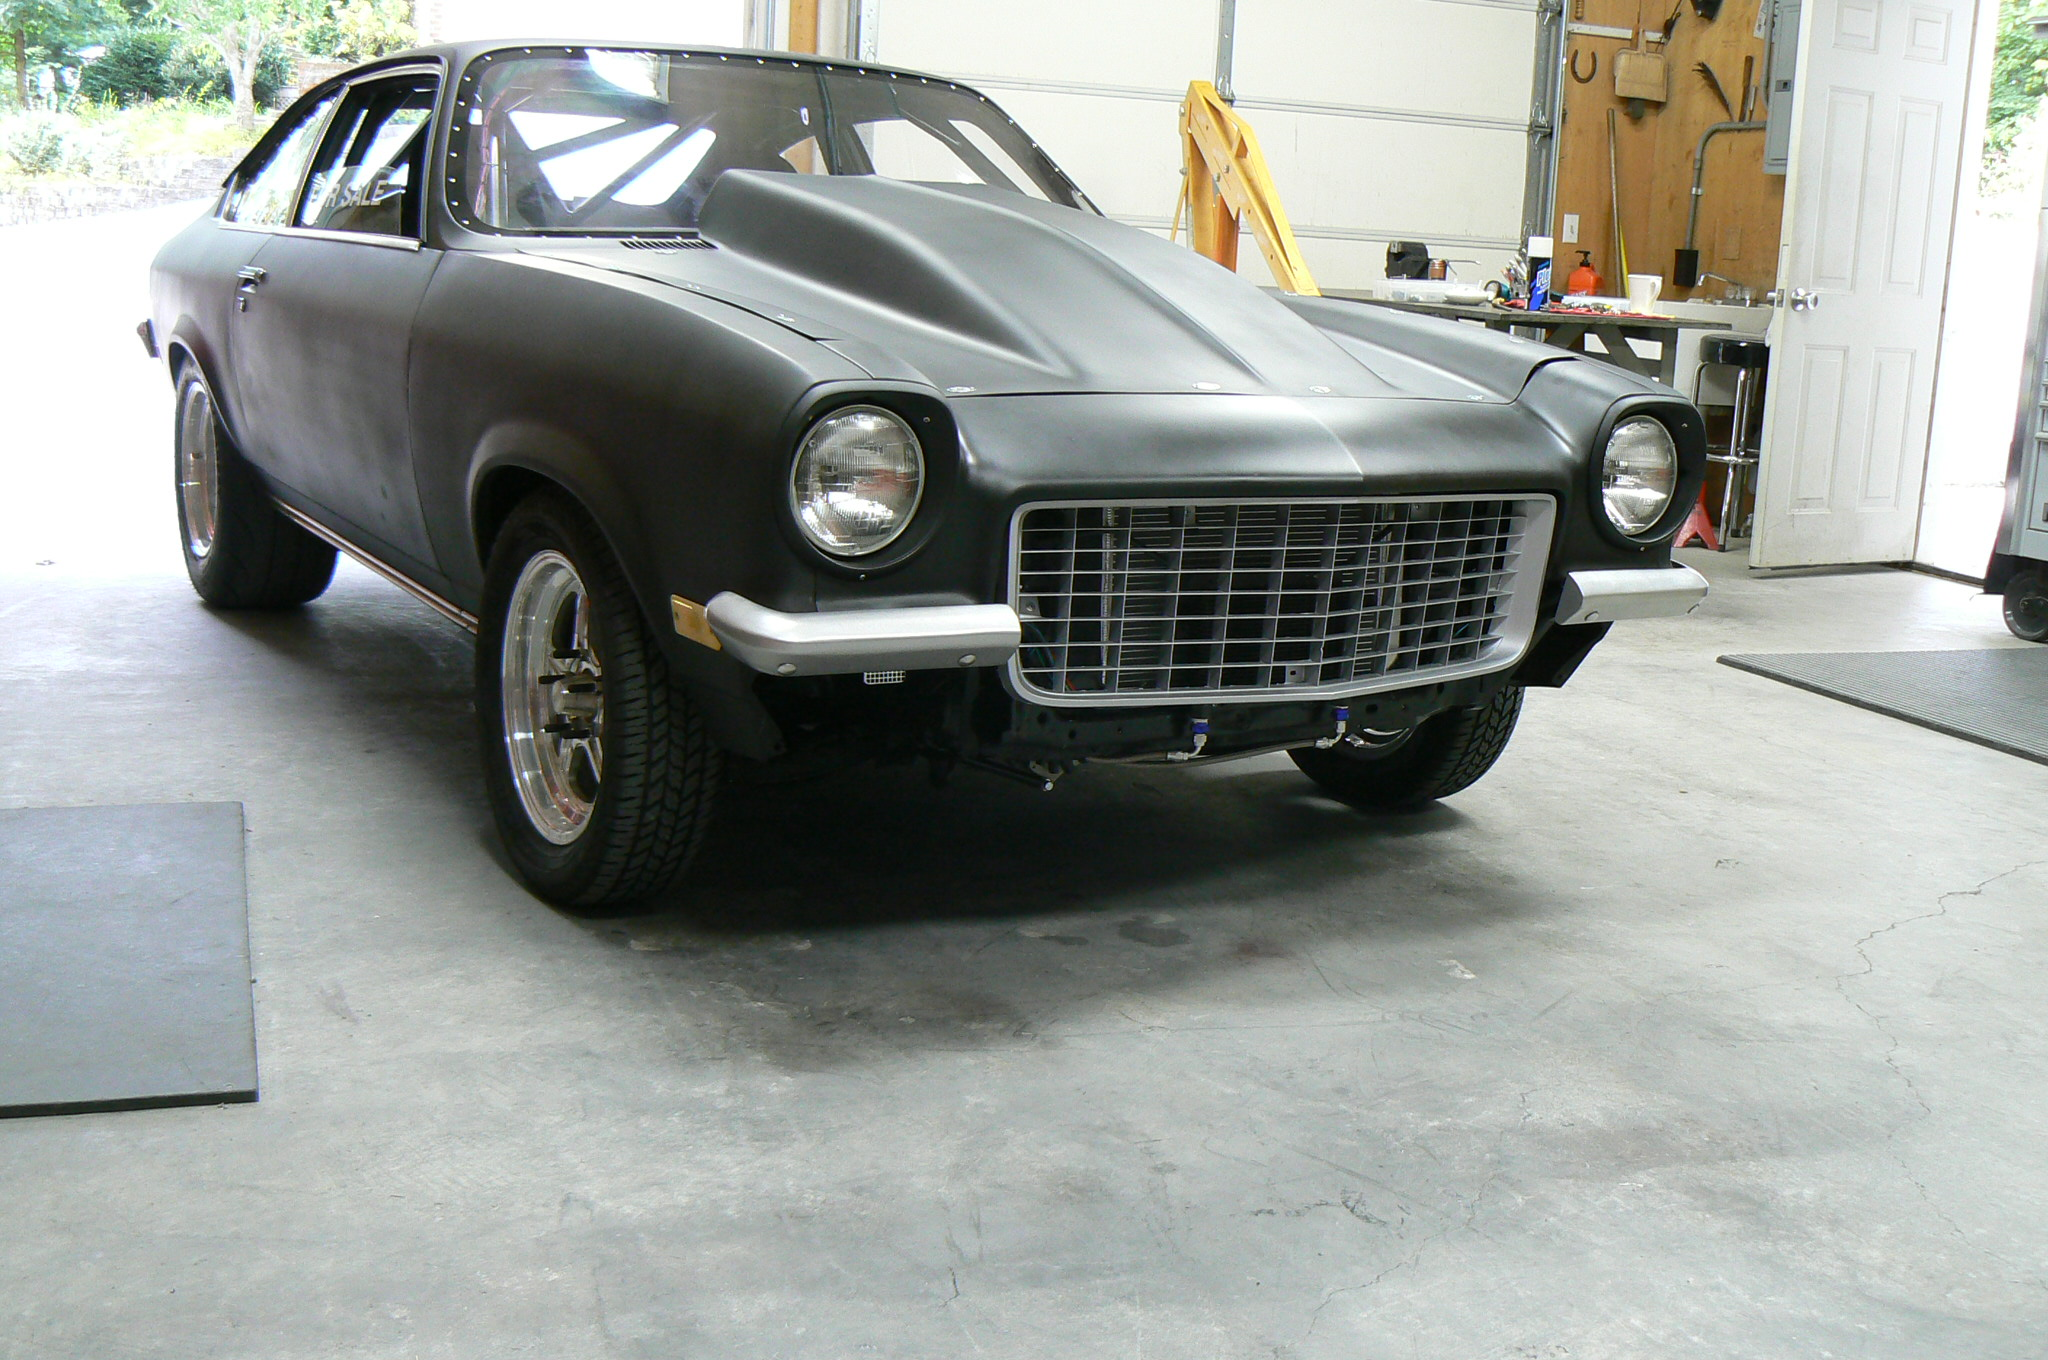 1972 Chevy Vega Street Car For Sale